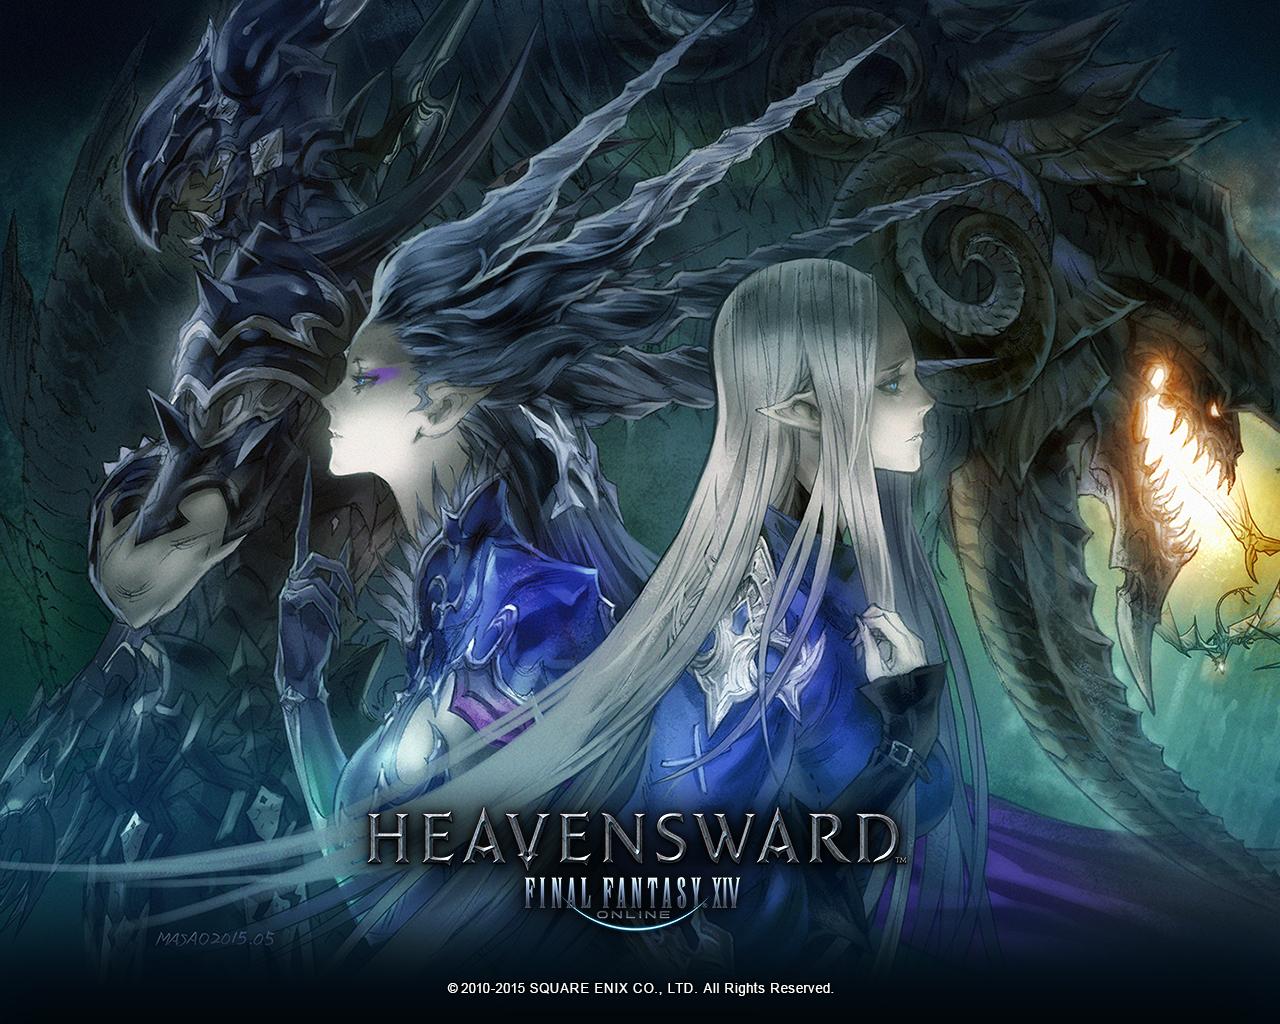 ff14 how to play black mage heavensward